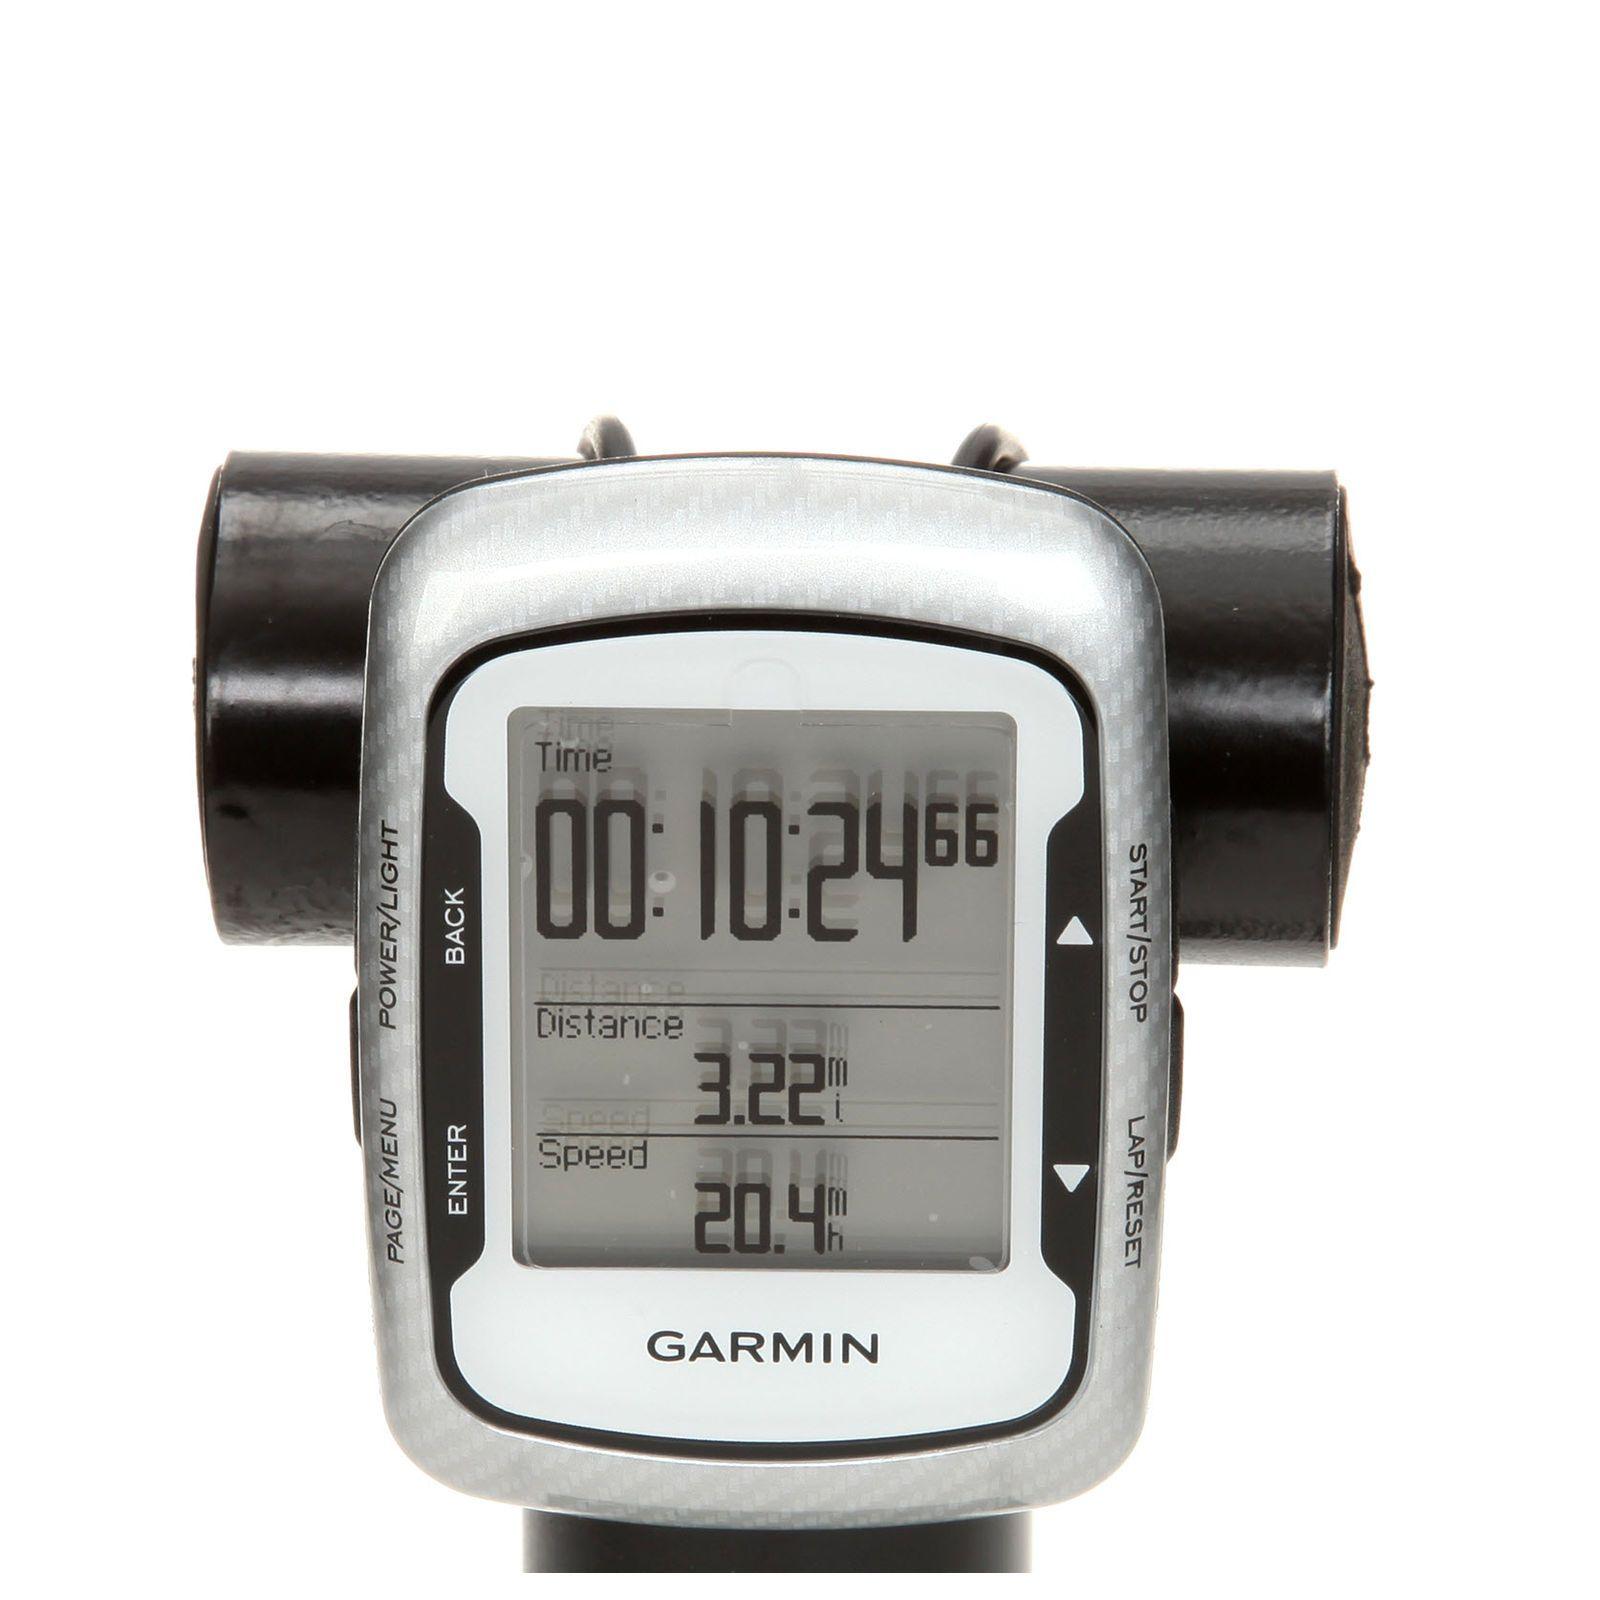 Wiggle | Garmin Edge 500 Black GPS Cycle Computer | GPS Cycle Computers - £176